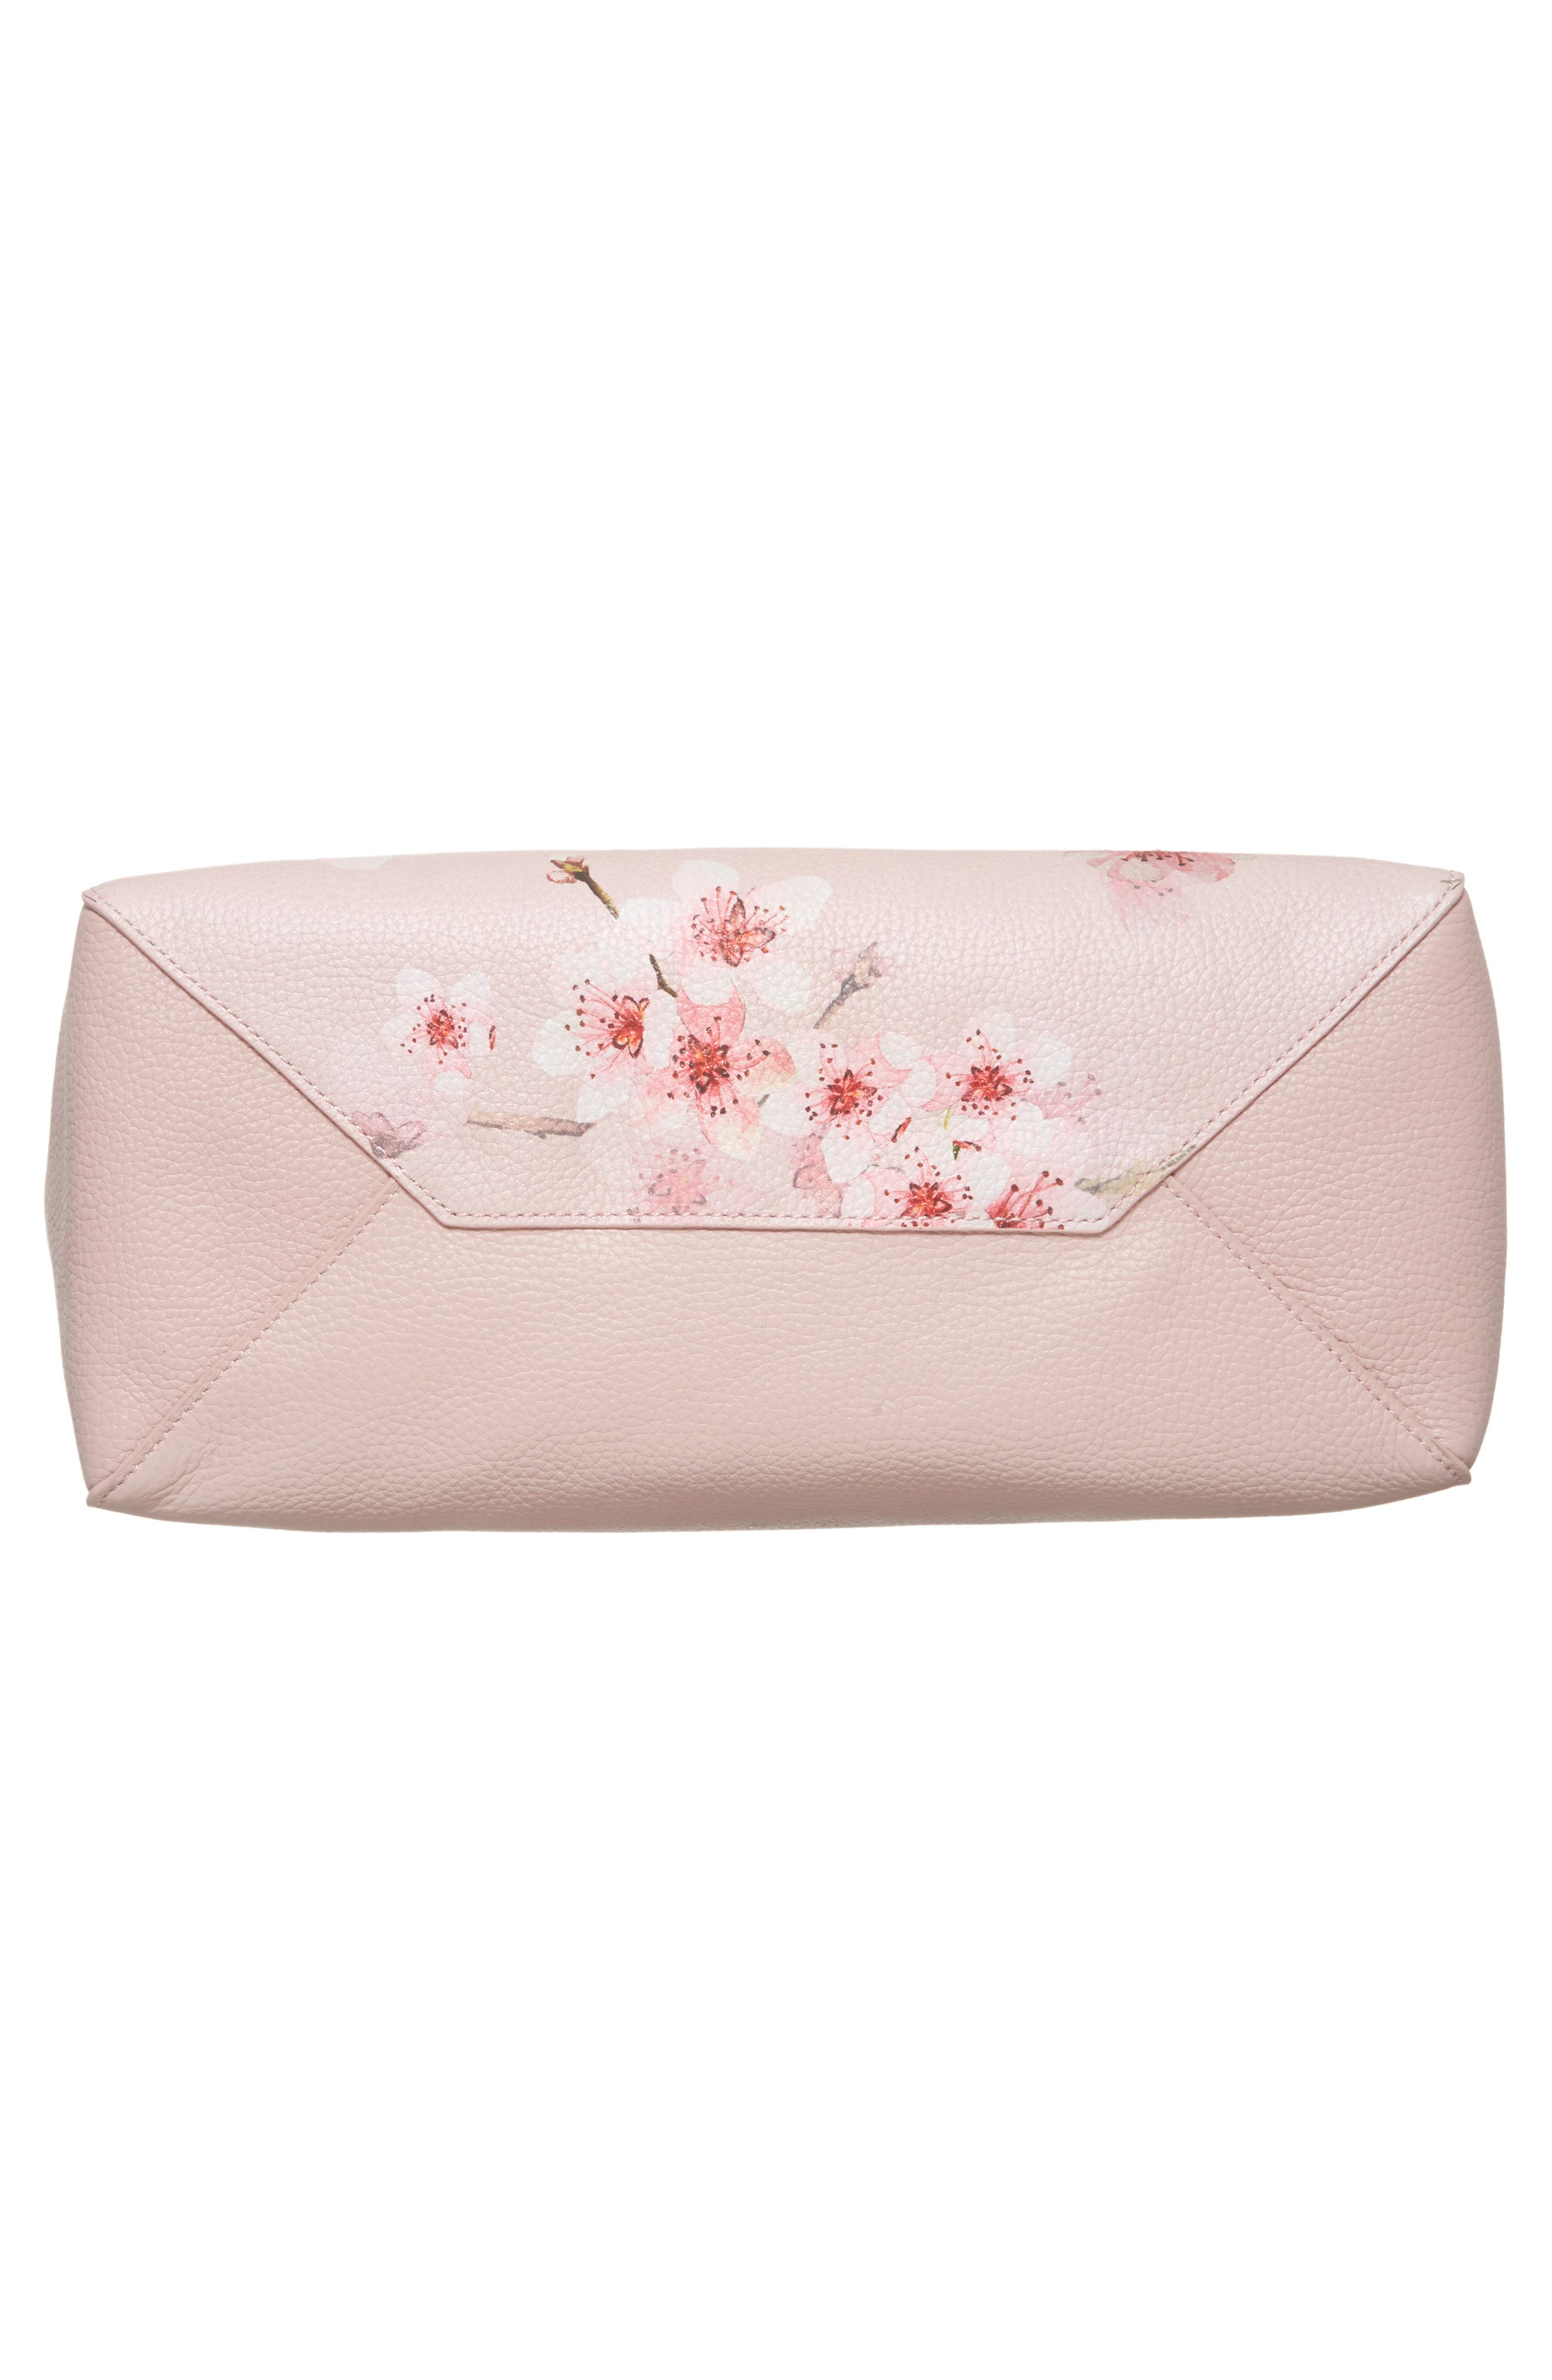 Soft Blossom Leather Shopper,                             Alternate thumbnail 6, color,